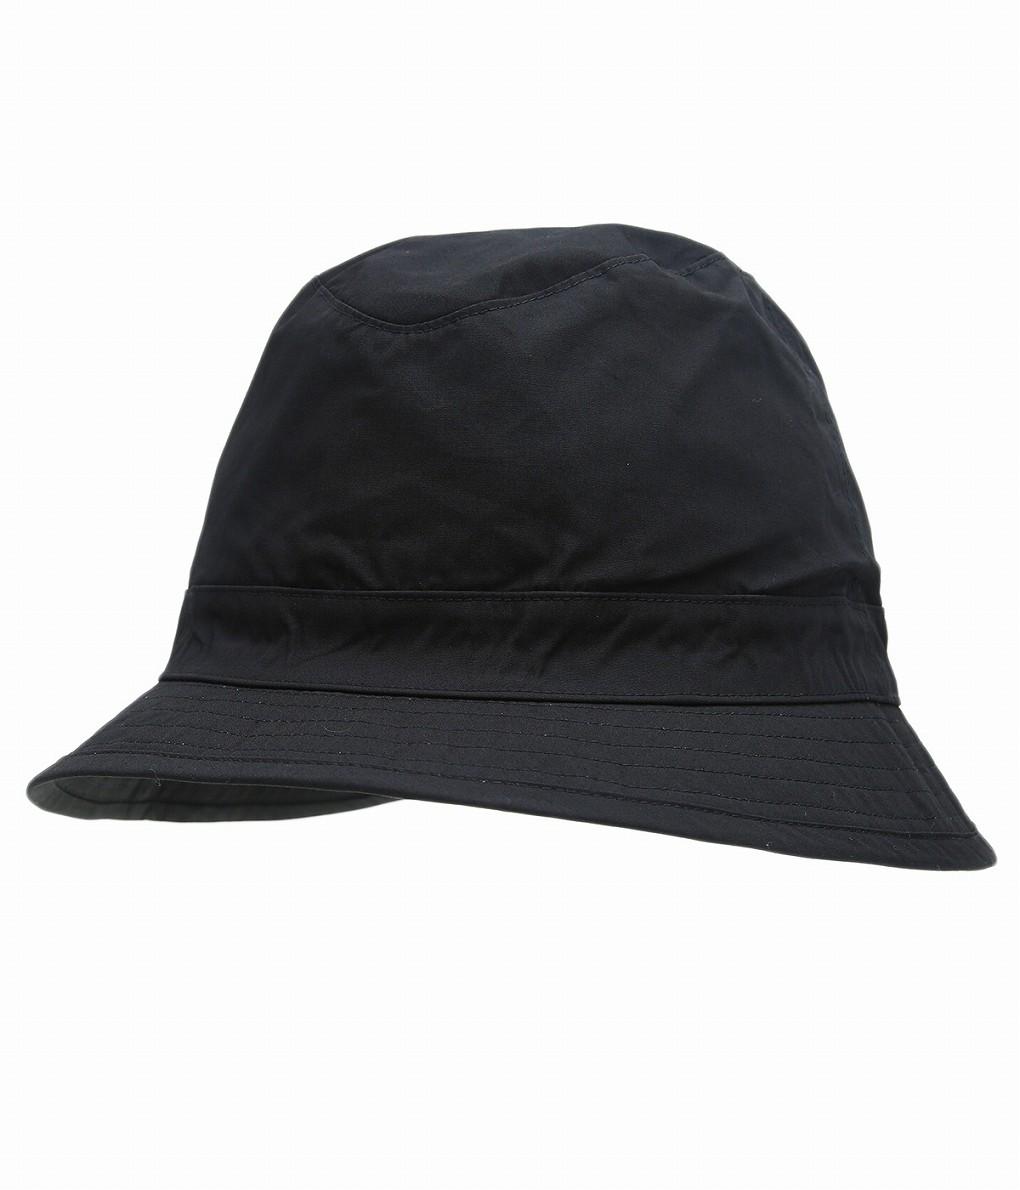 KIJIMA TAKAYUKI / キジマ タカユキ : Poplin Soft Hat : ポプリンソフトハット 帽子 ハット メンズ バケットハット : 201105 【RIP】